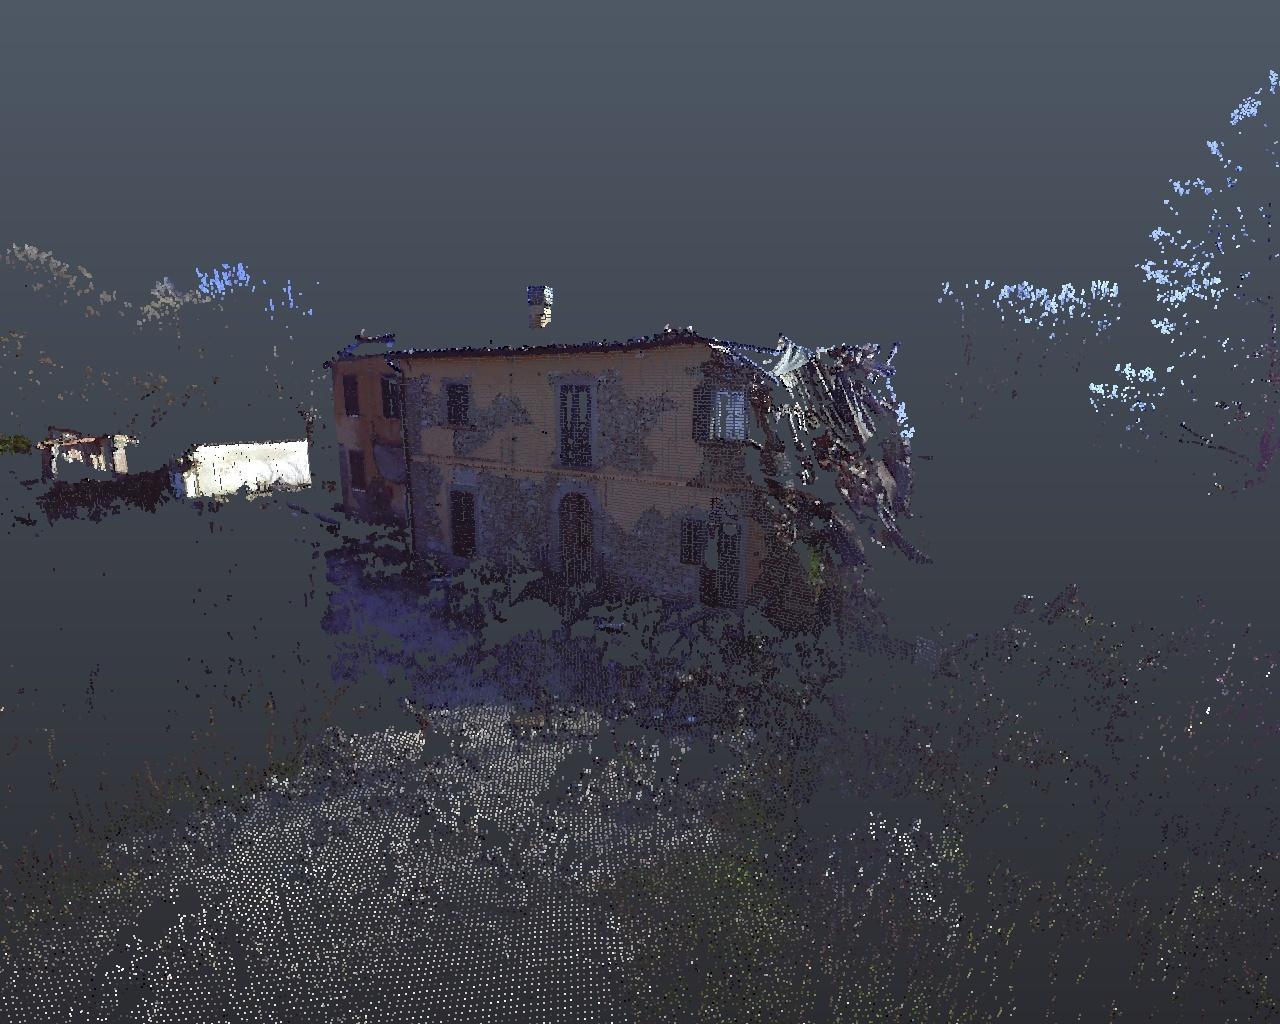 Rilievo laser scanner: fabbricato terremoto Amatrice - facciata frontale 2